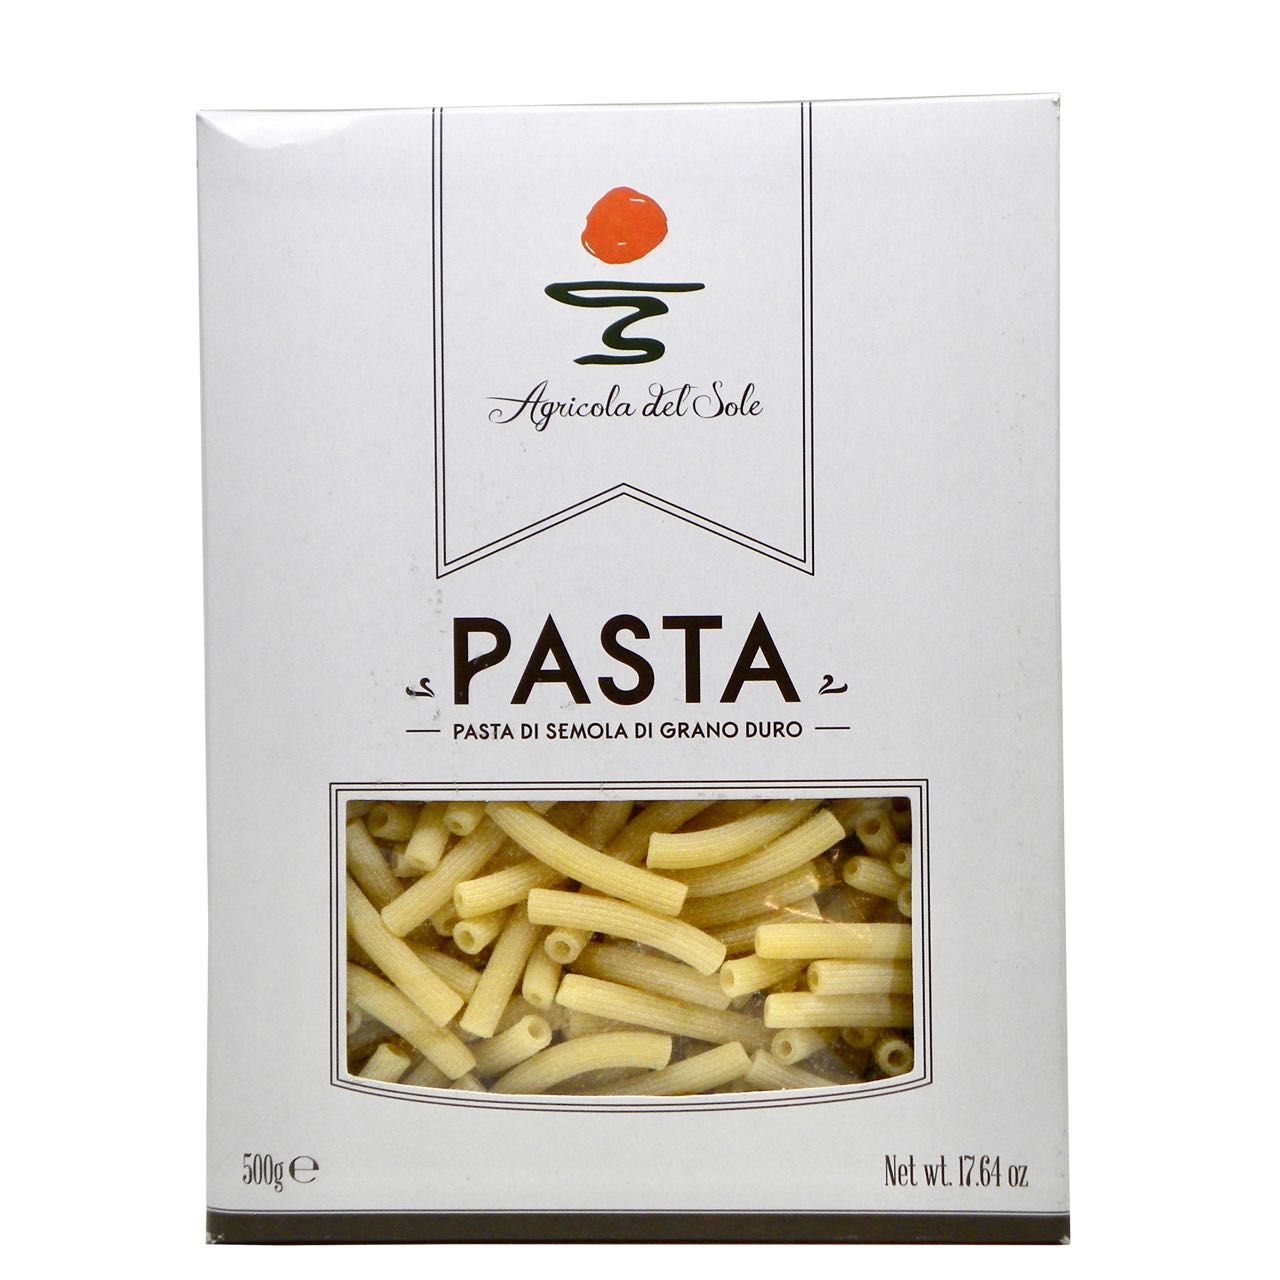 maccheroncini agricola del sole pasta artigianale – agricola del sole artisan pasta maccheroncini – Gustorotondo Italian food boutique – I migliori cibi online – Best Italian foods online – spesa online